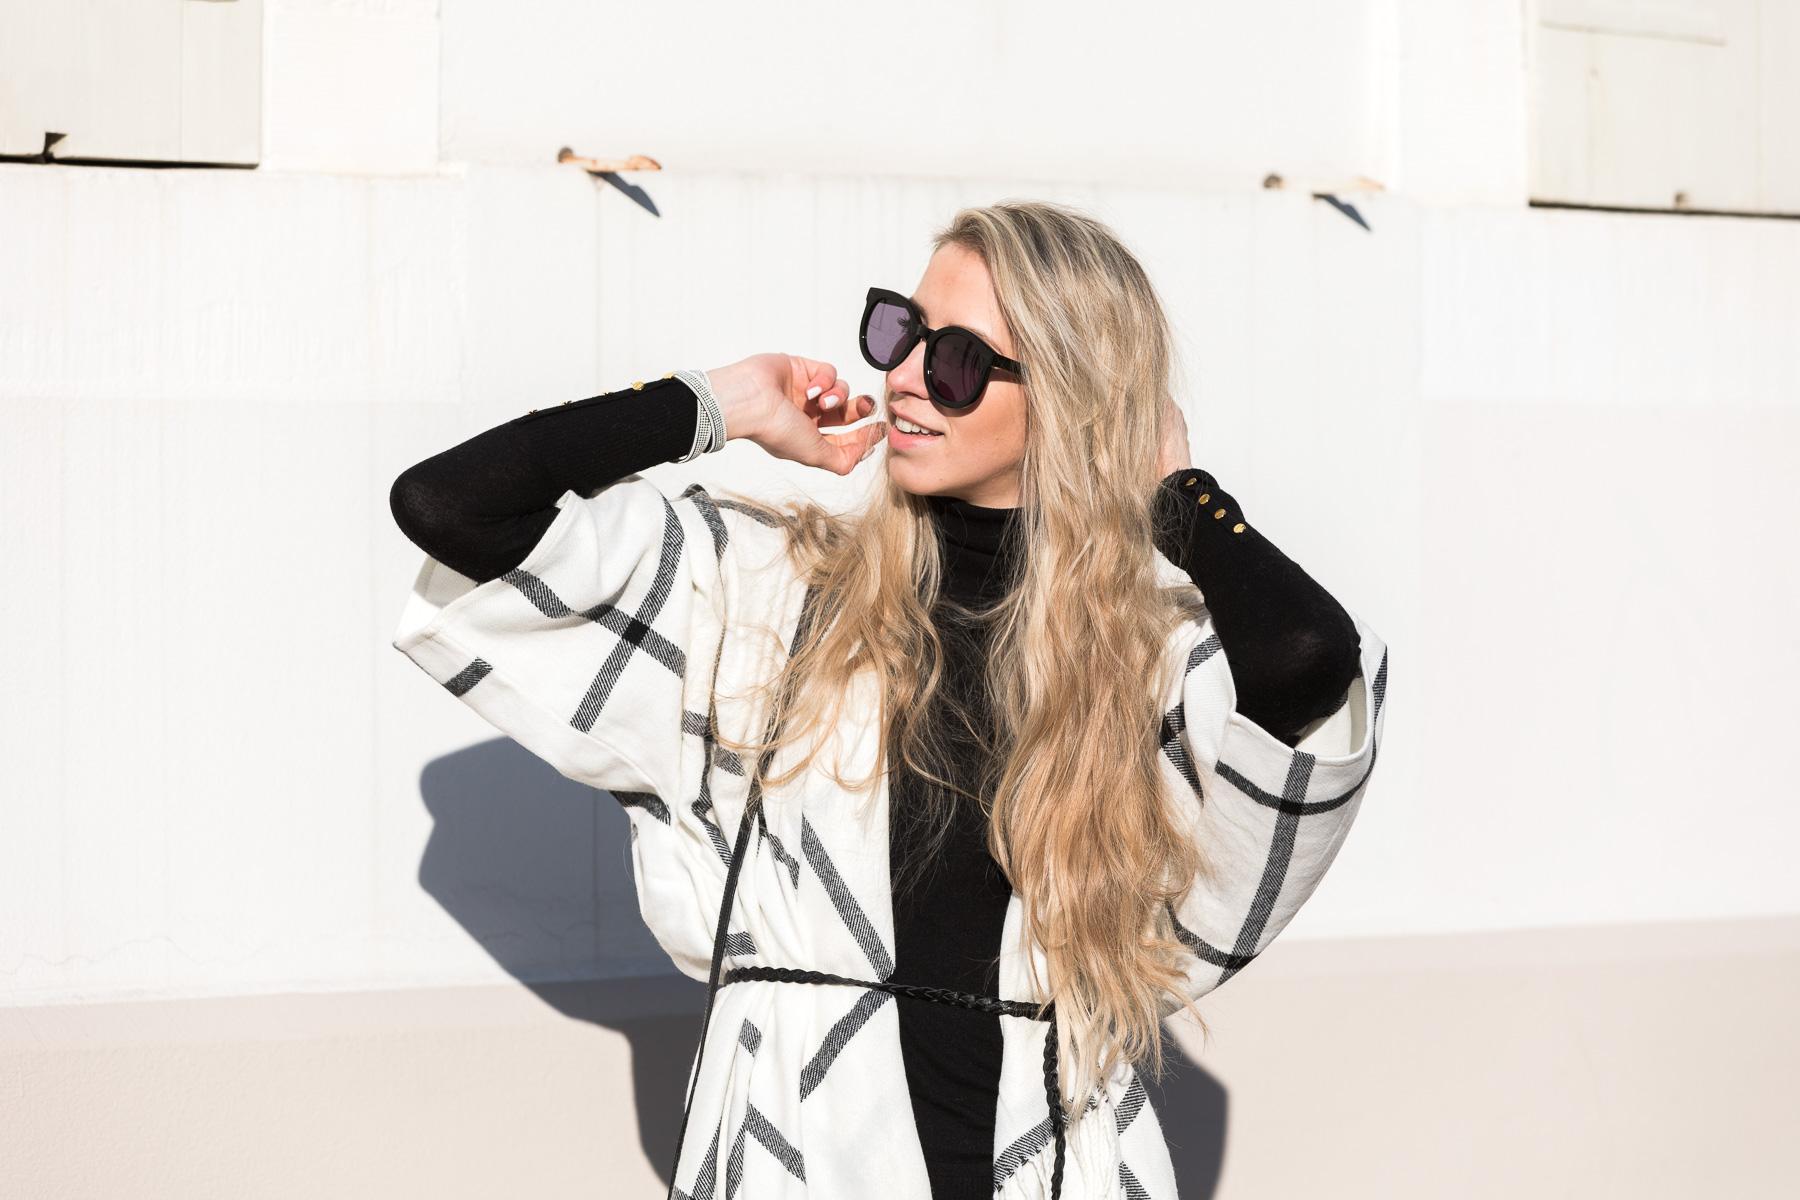 Soultalk Fashionblogger Modeblog Blonde Bloggerin Edited Cape Apple of Eden Netzstrumpfhose Trend